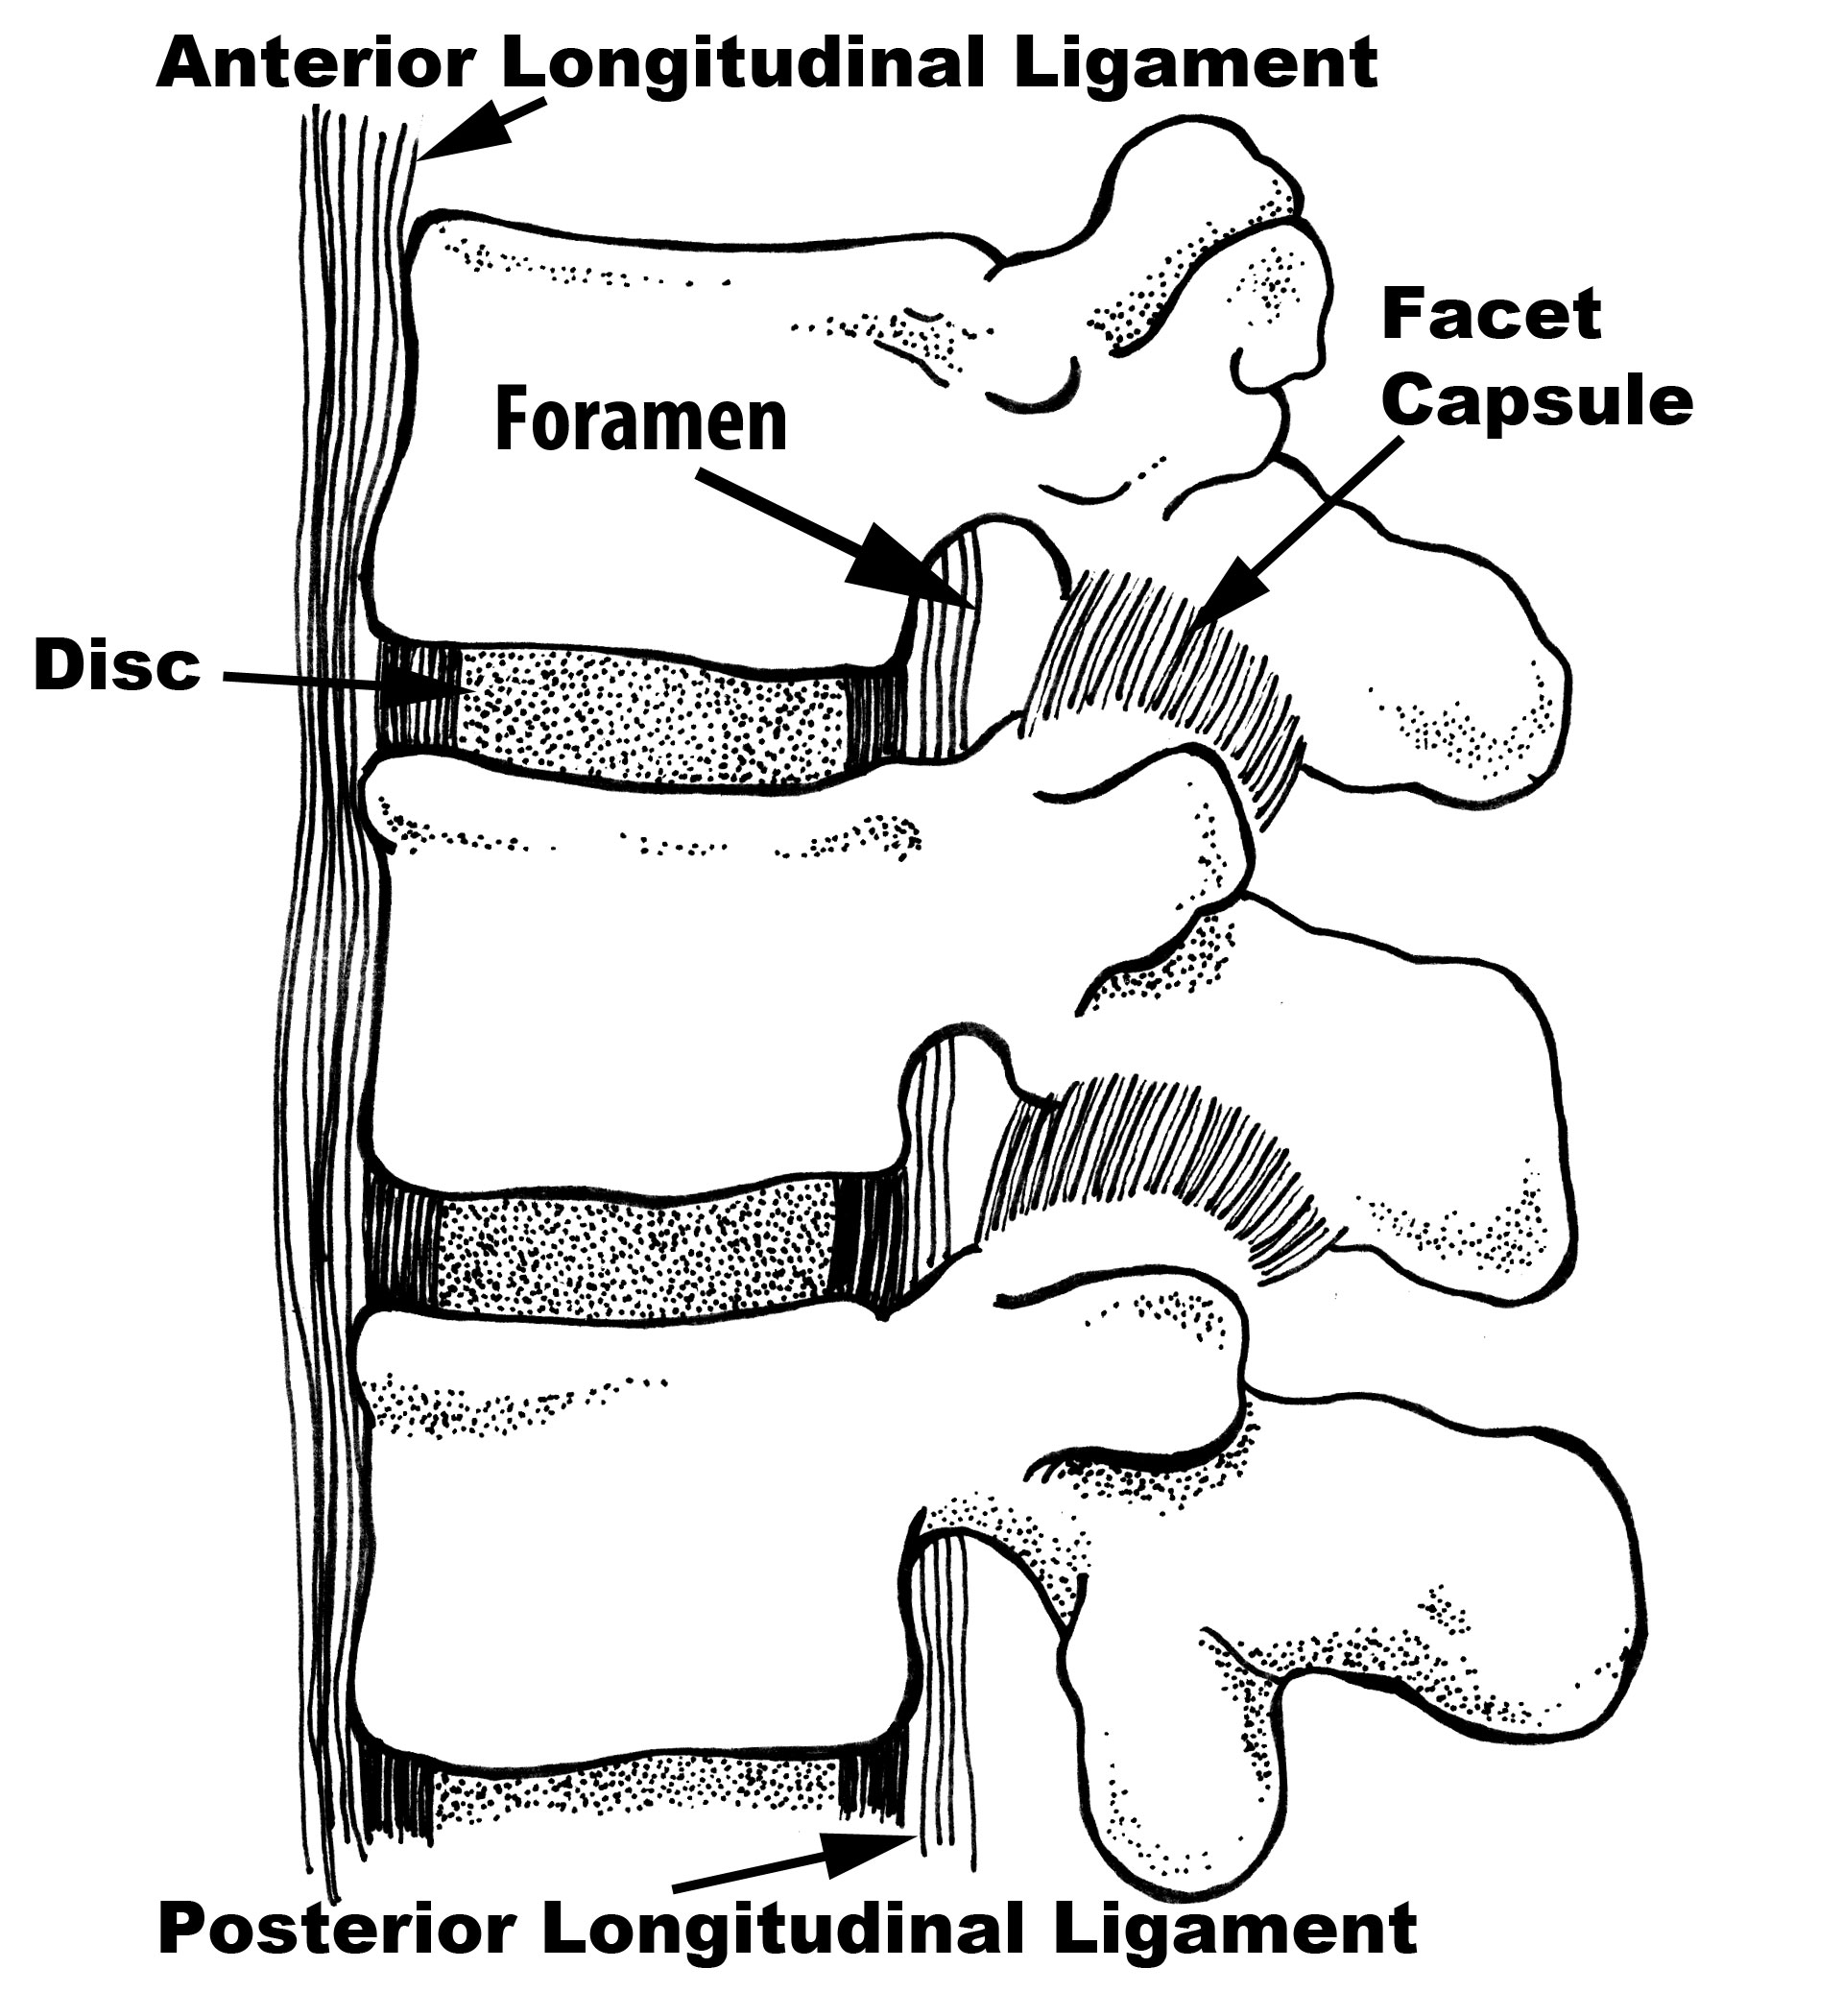 Foraminal Collapse